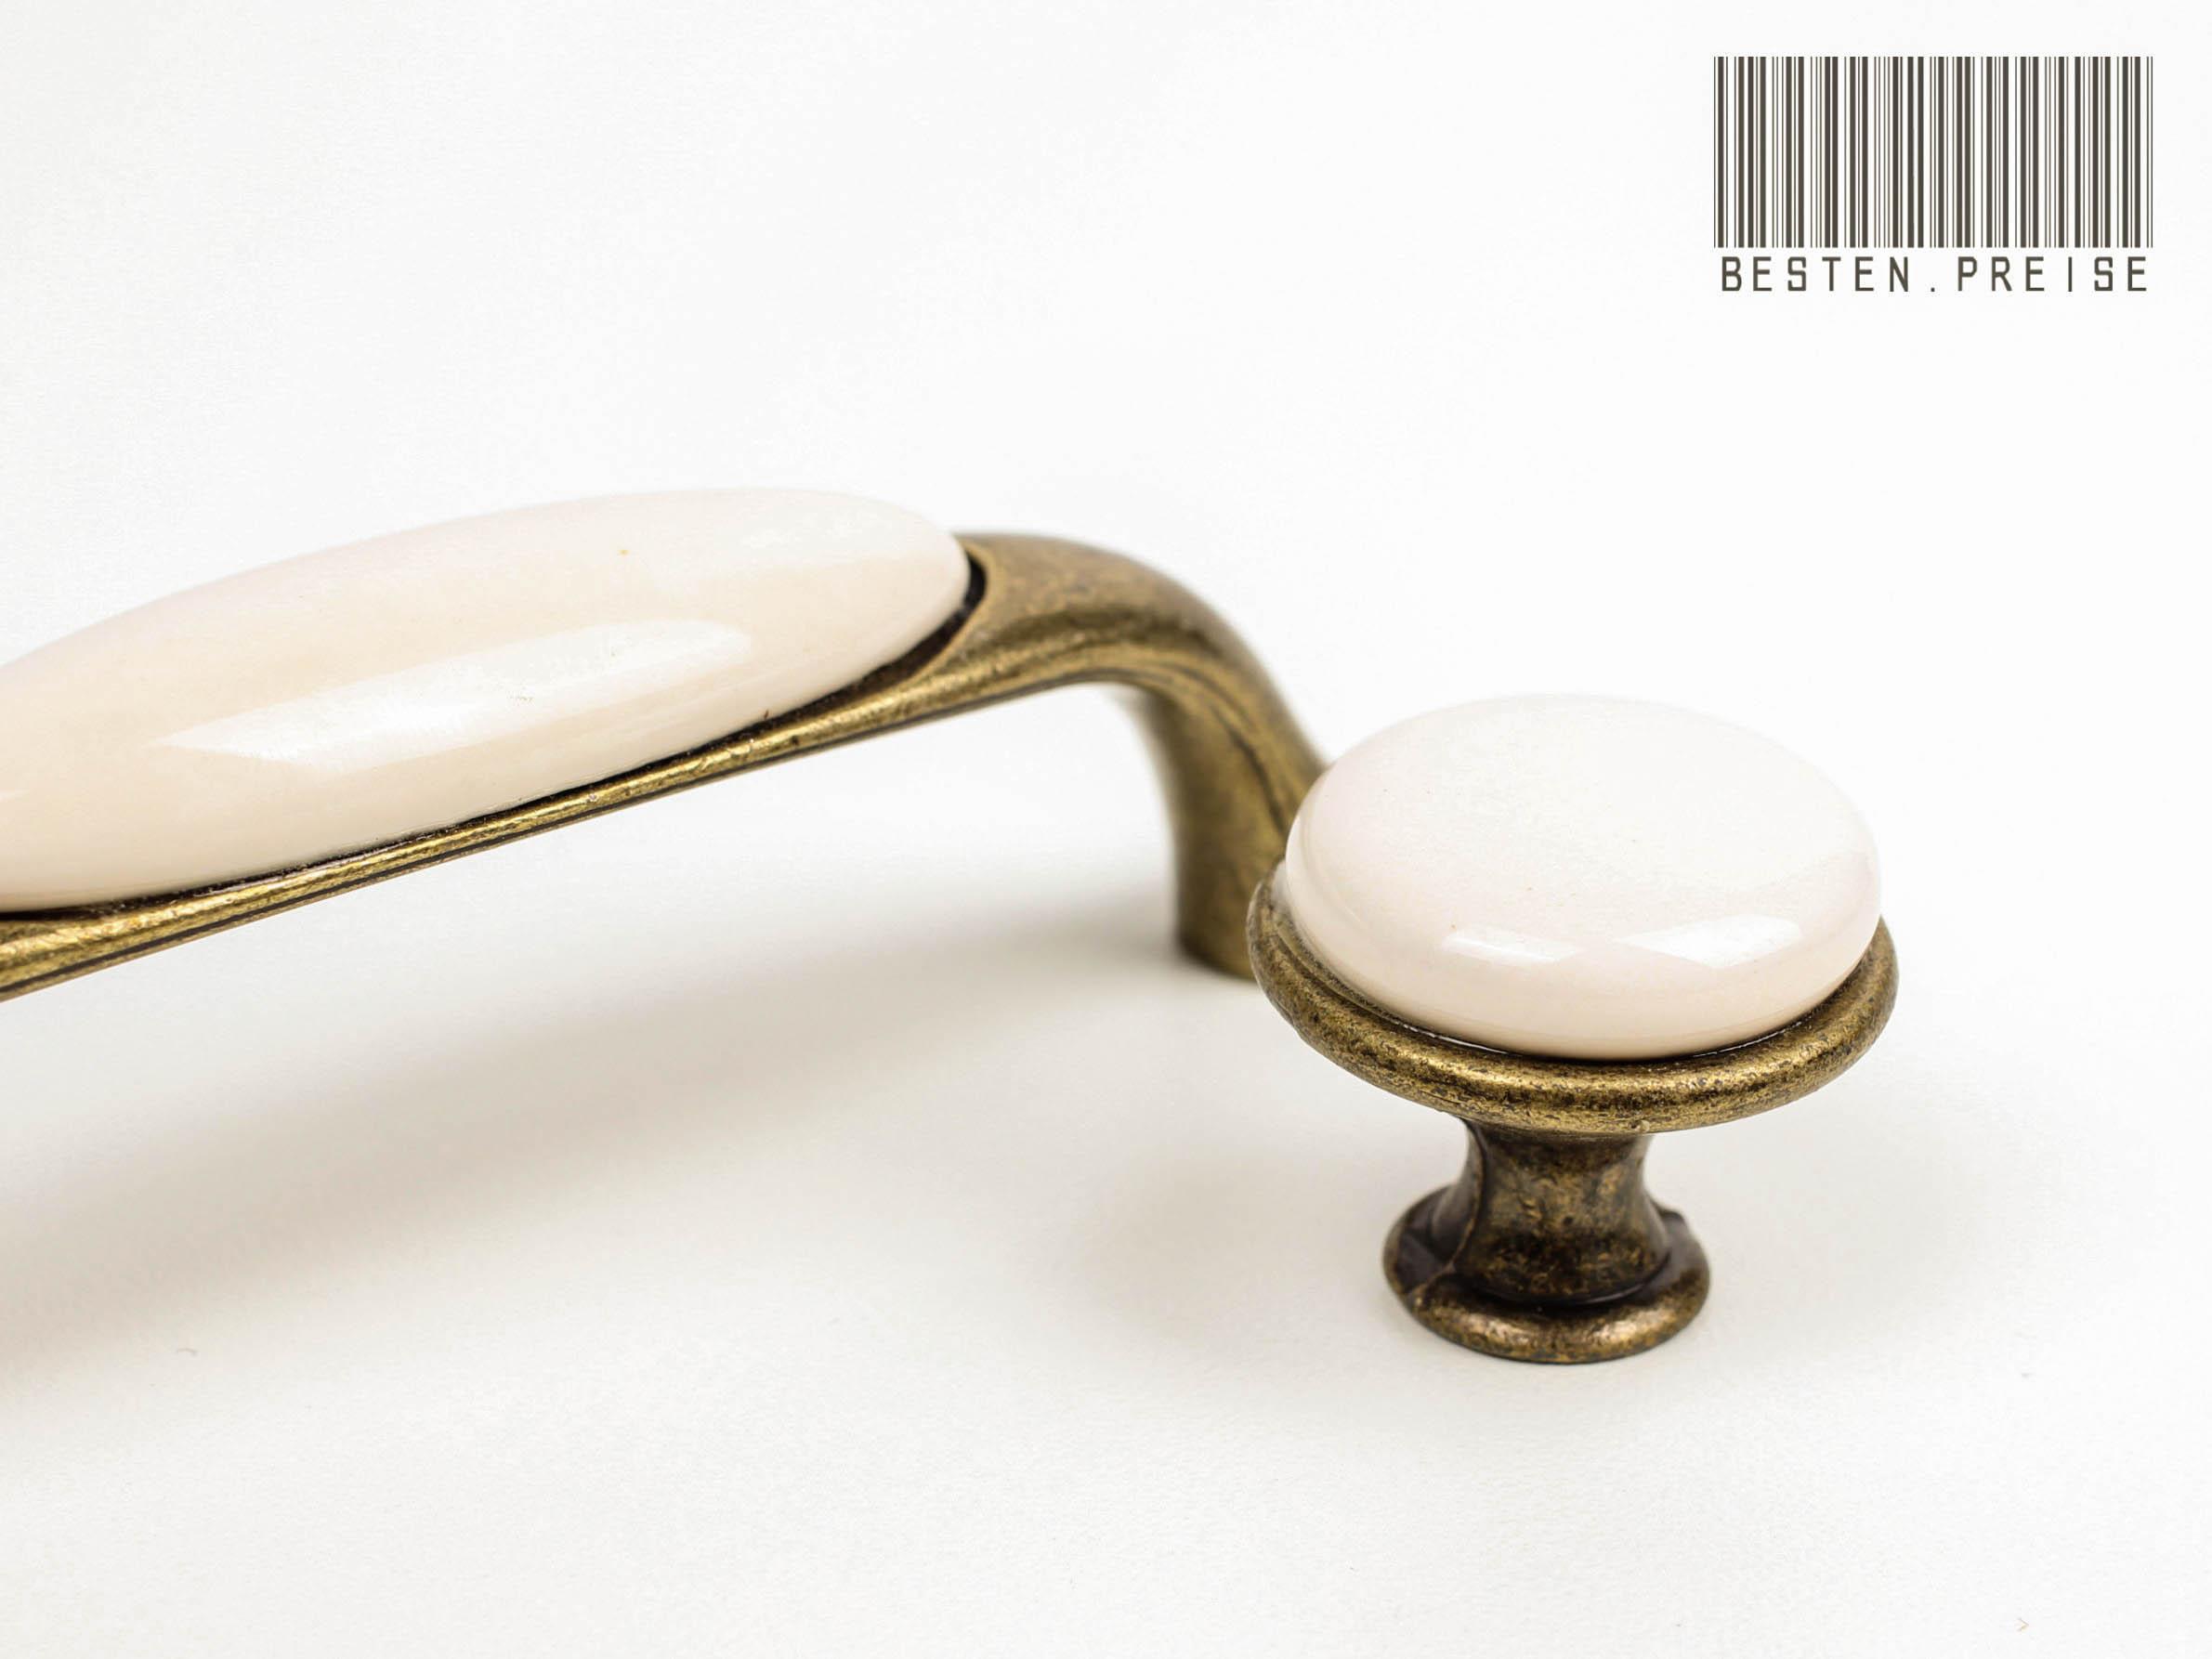 retro antik porzellangriffe m belgriffe m belgriff porzellangriff porzellankn pf ebay. Black Bedroom Furniture Sets. Home Design Ideas